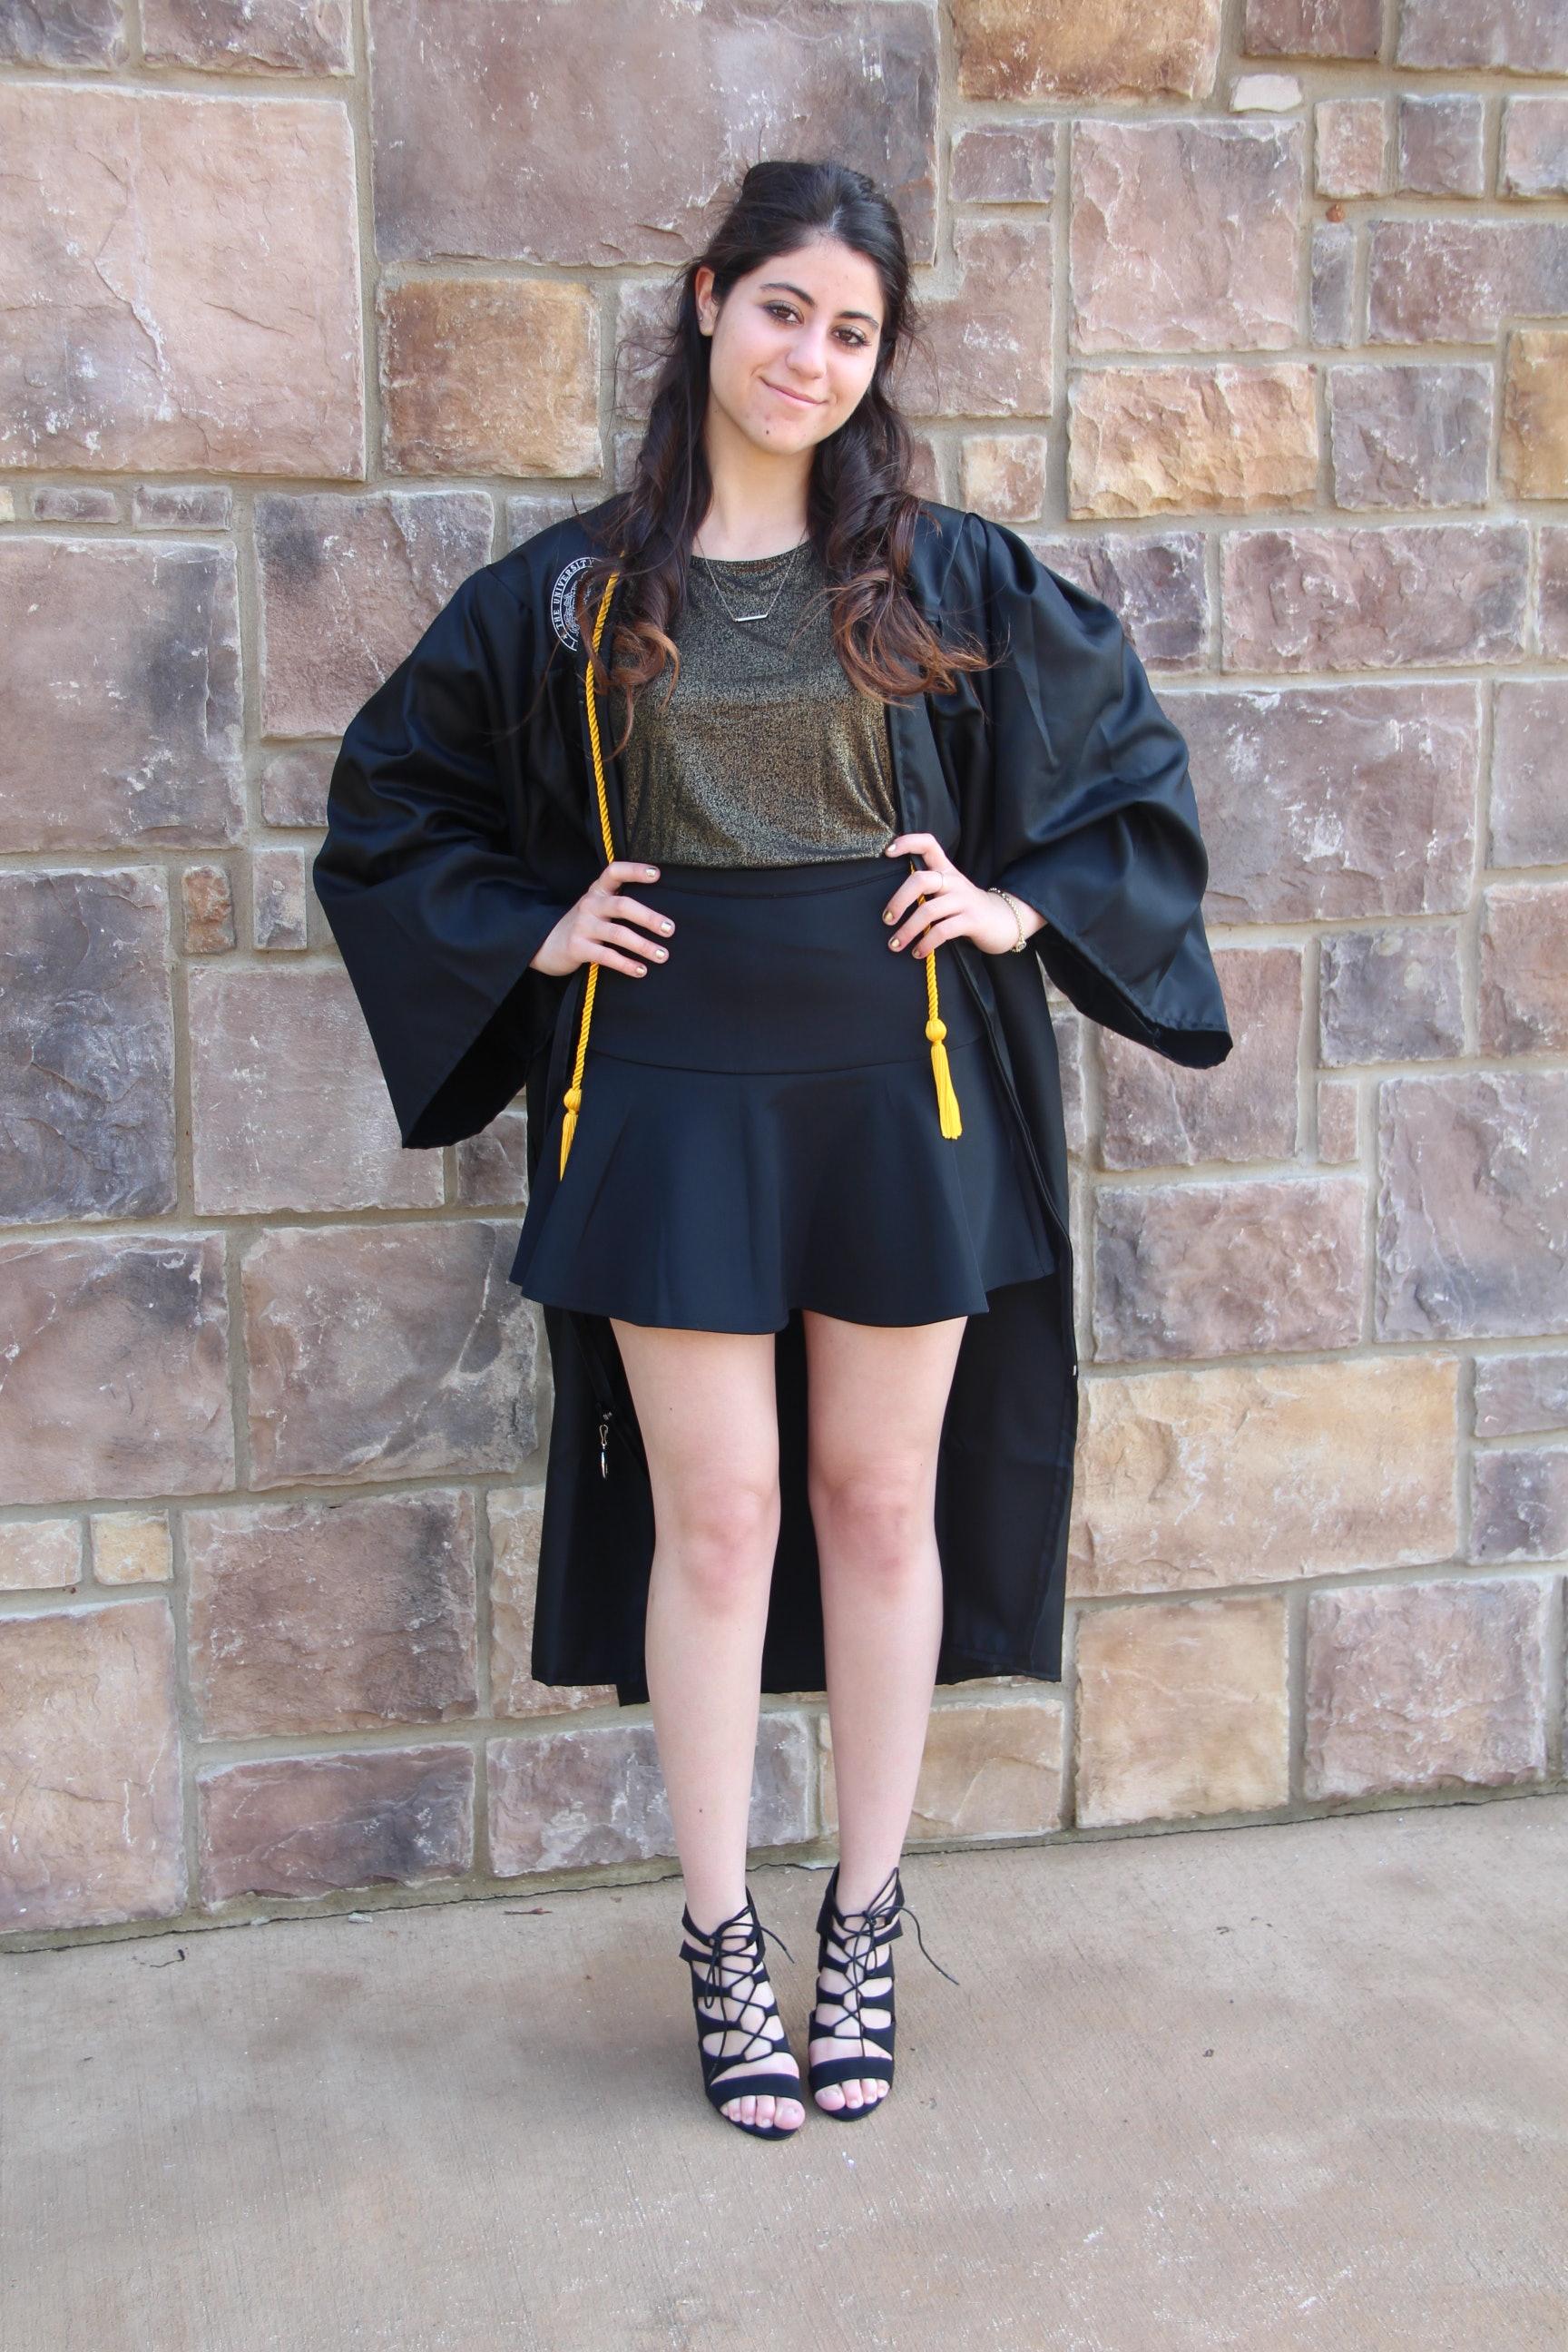 High School Graduation Ceremony Clothes - what parents wear to a high school graduation our ...